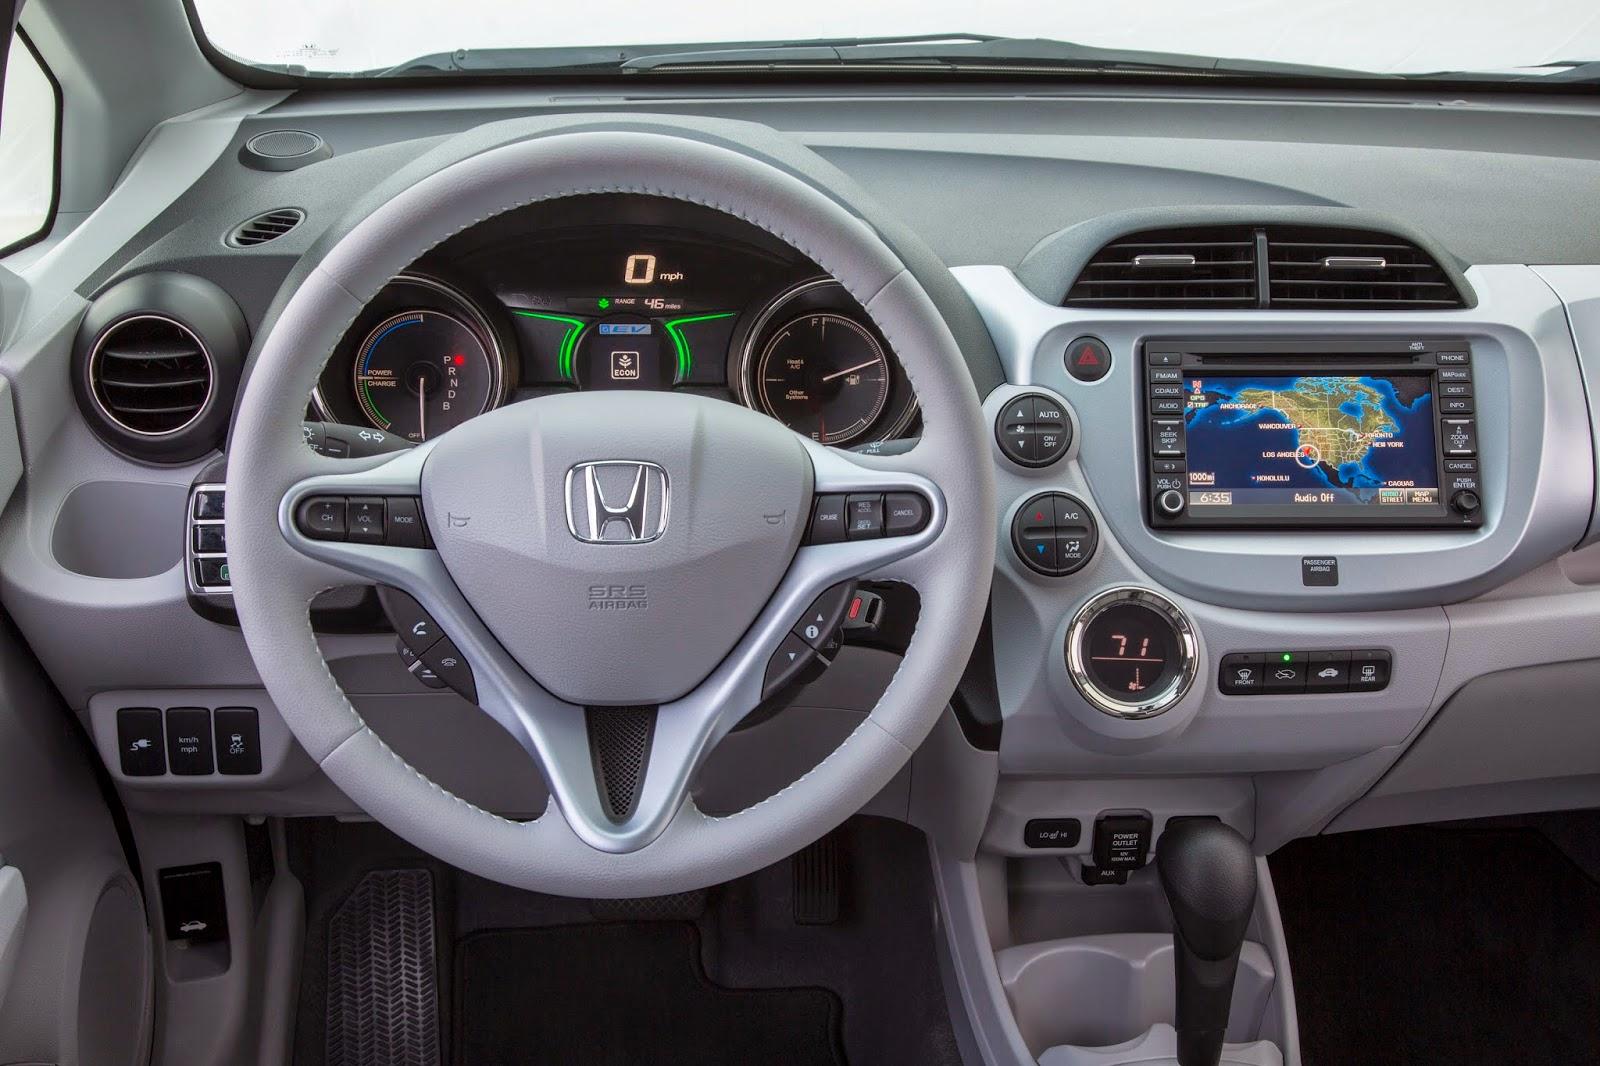 Interior view of 2014 Honda Fit EV